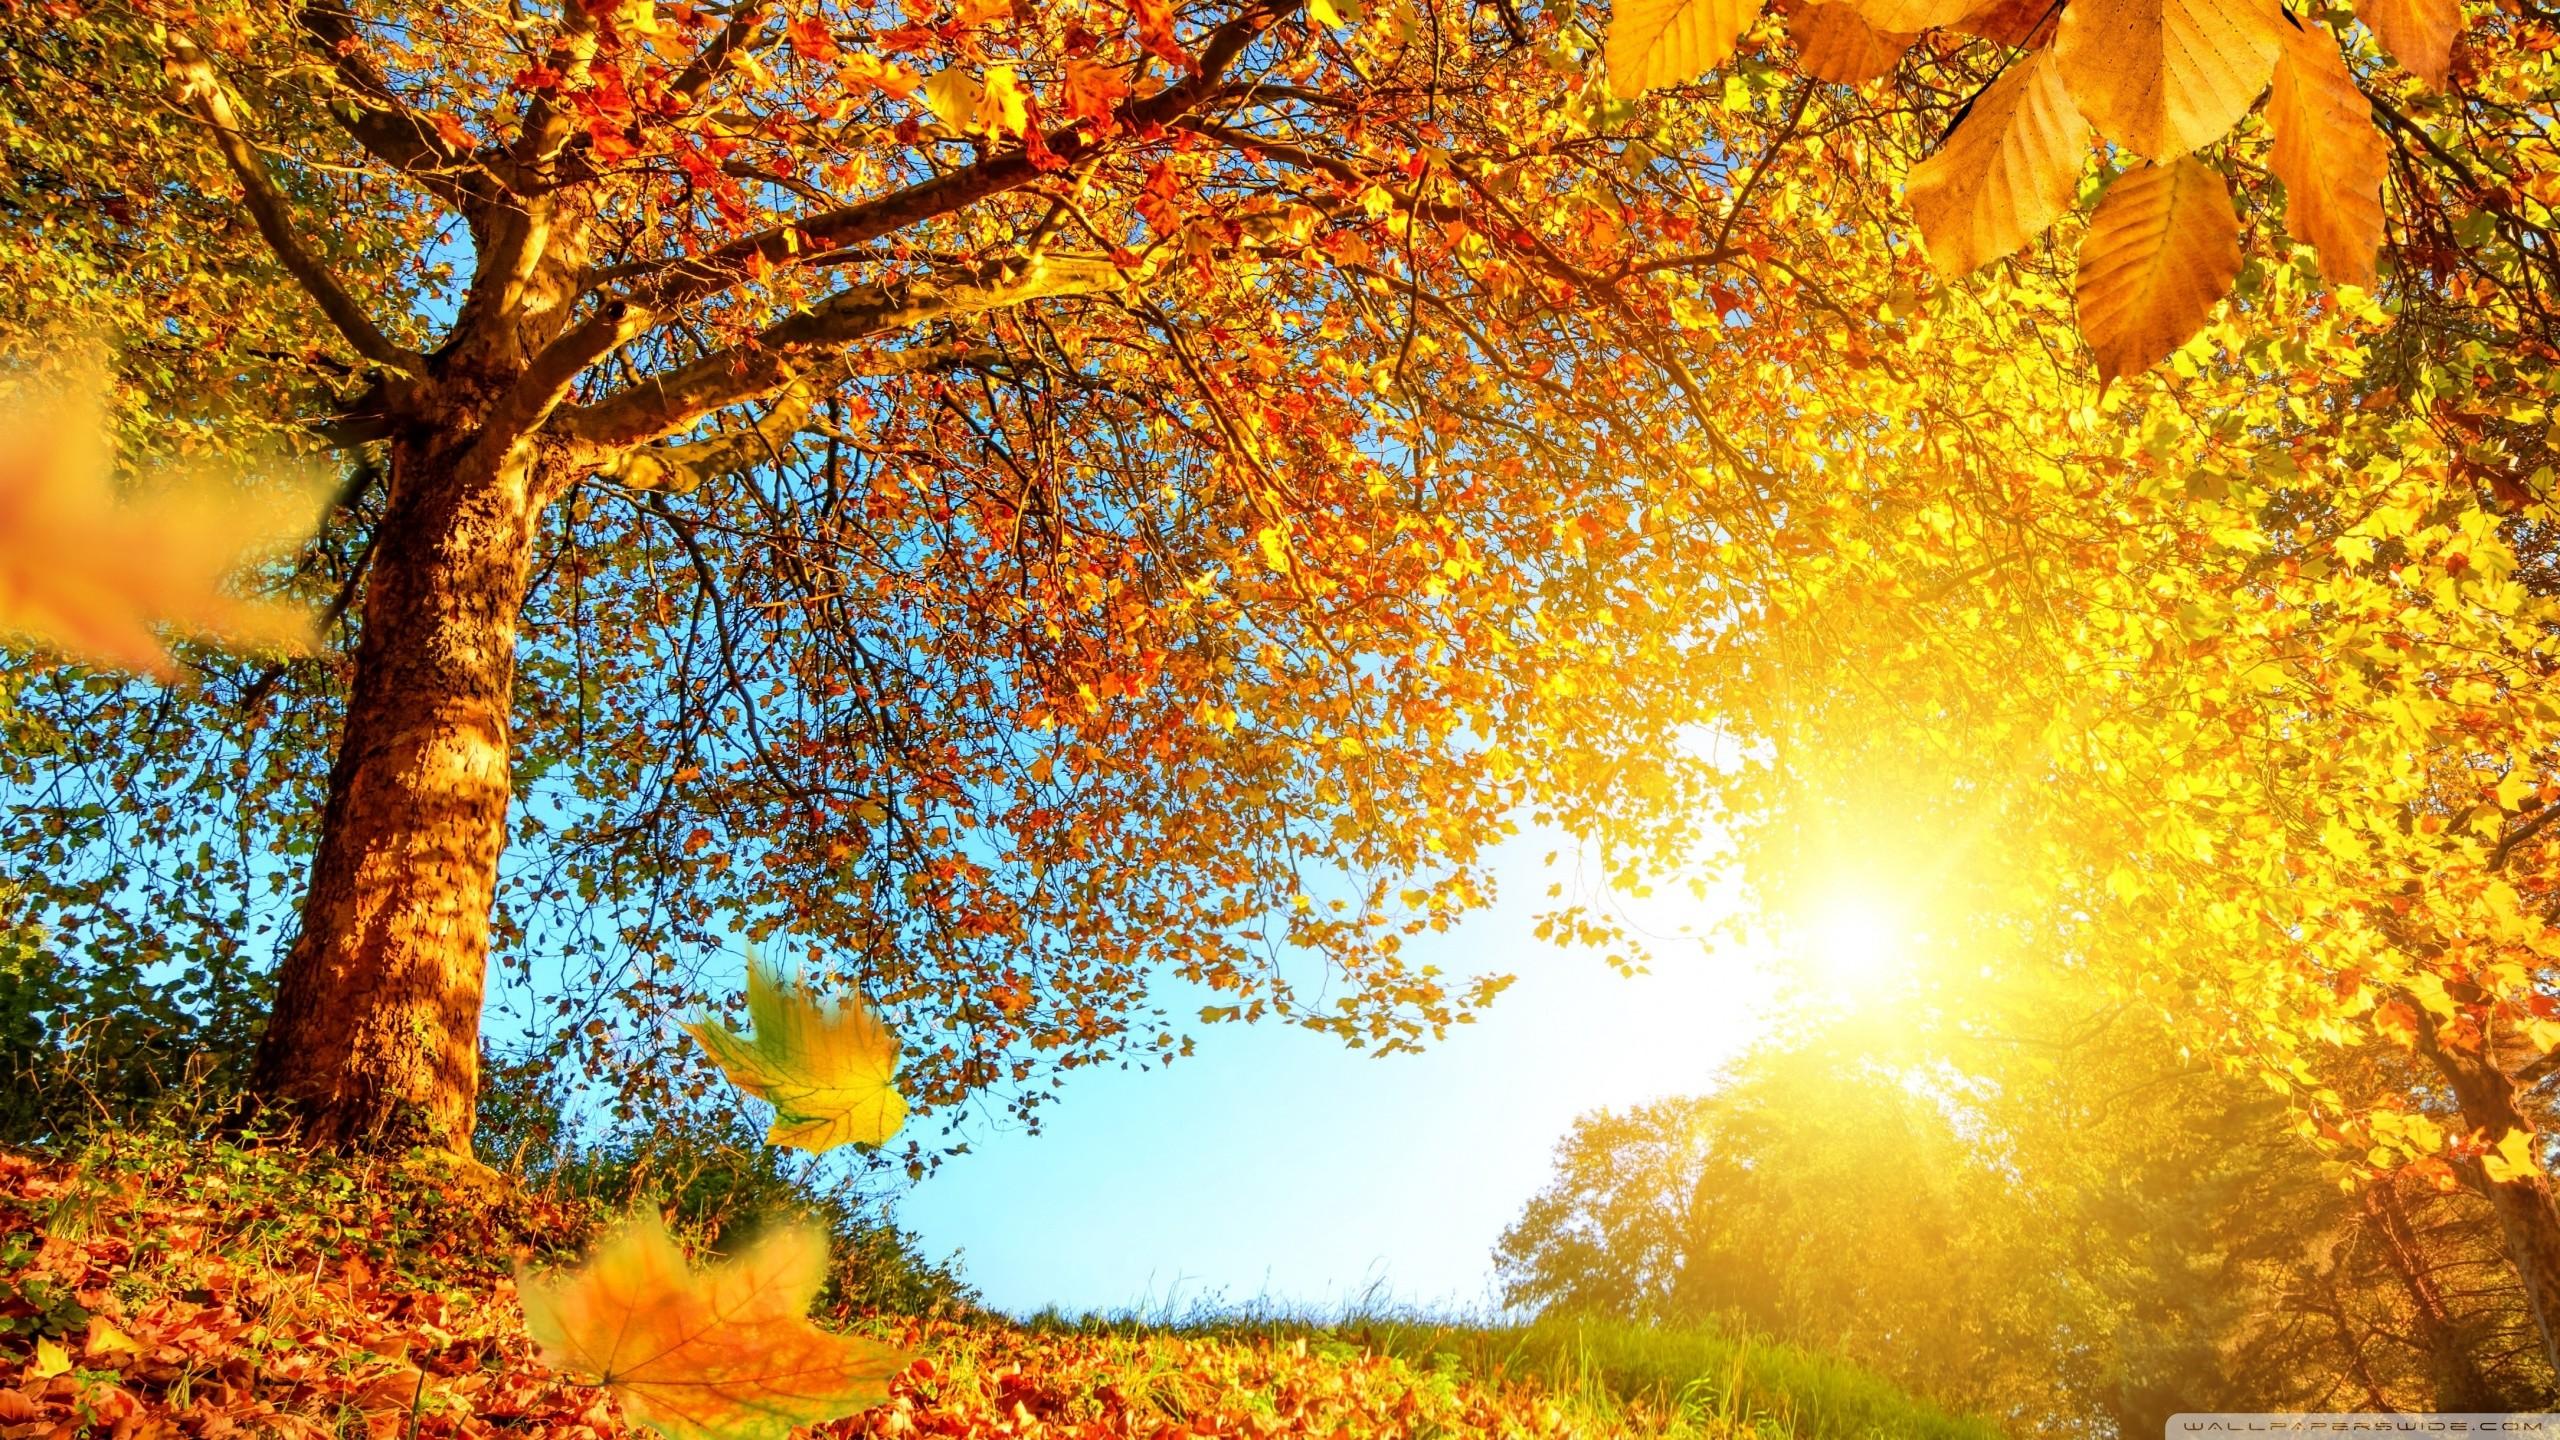 Autumn landscape wallpaper wallpapertag for Paesaggi autunnali per desktop